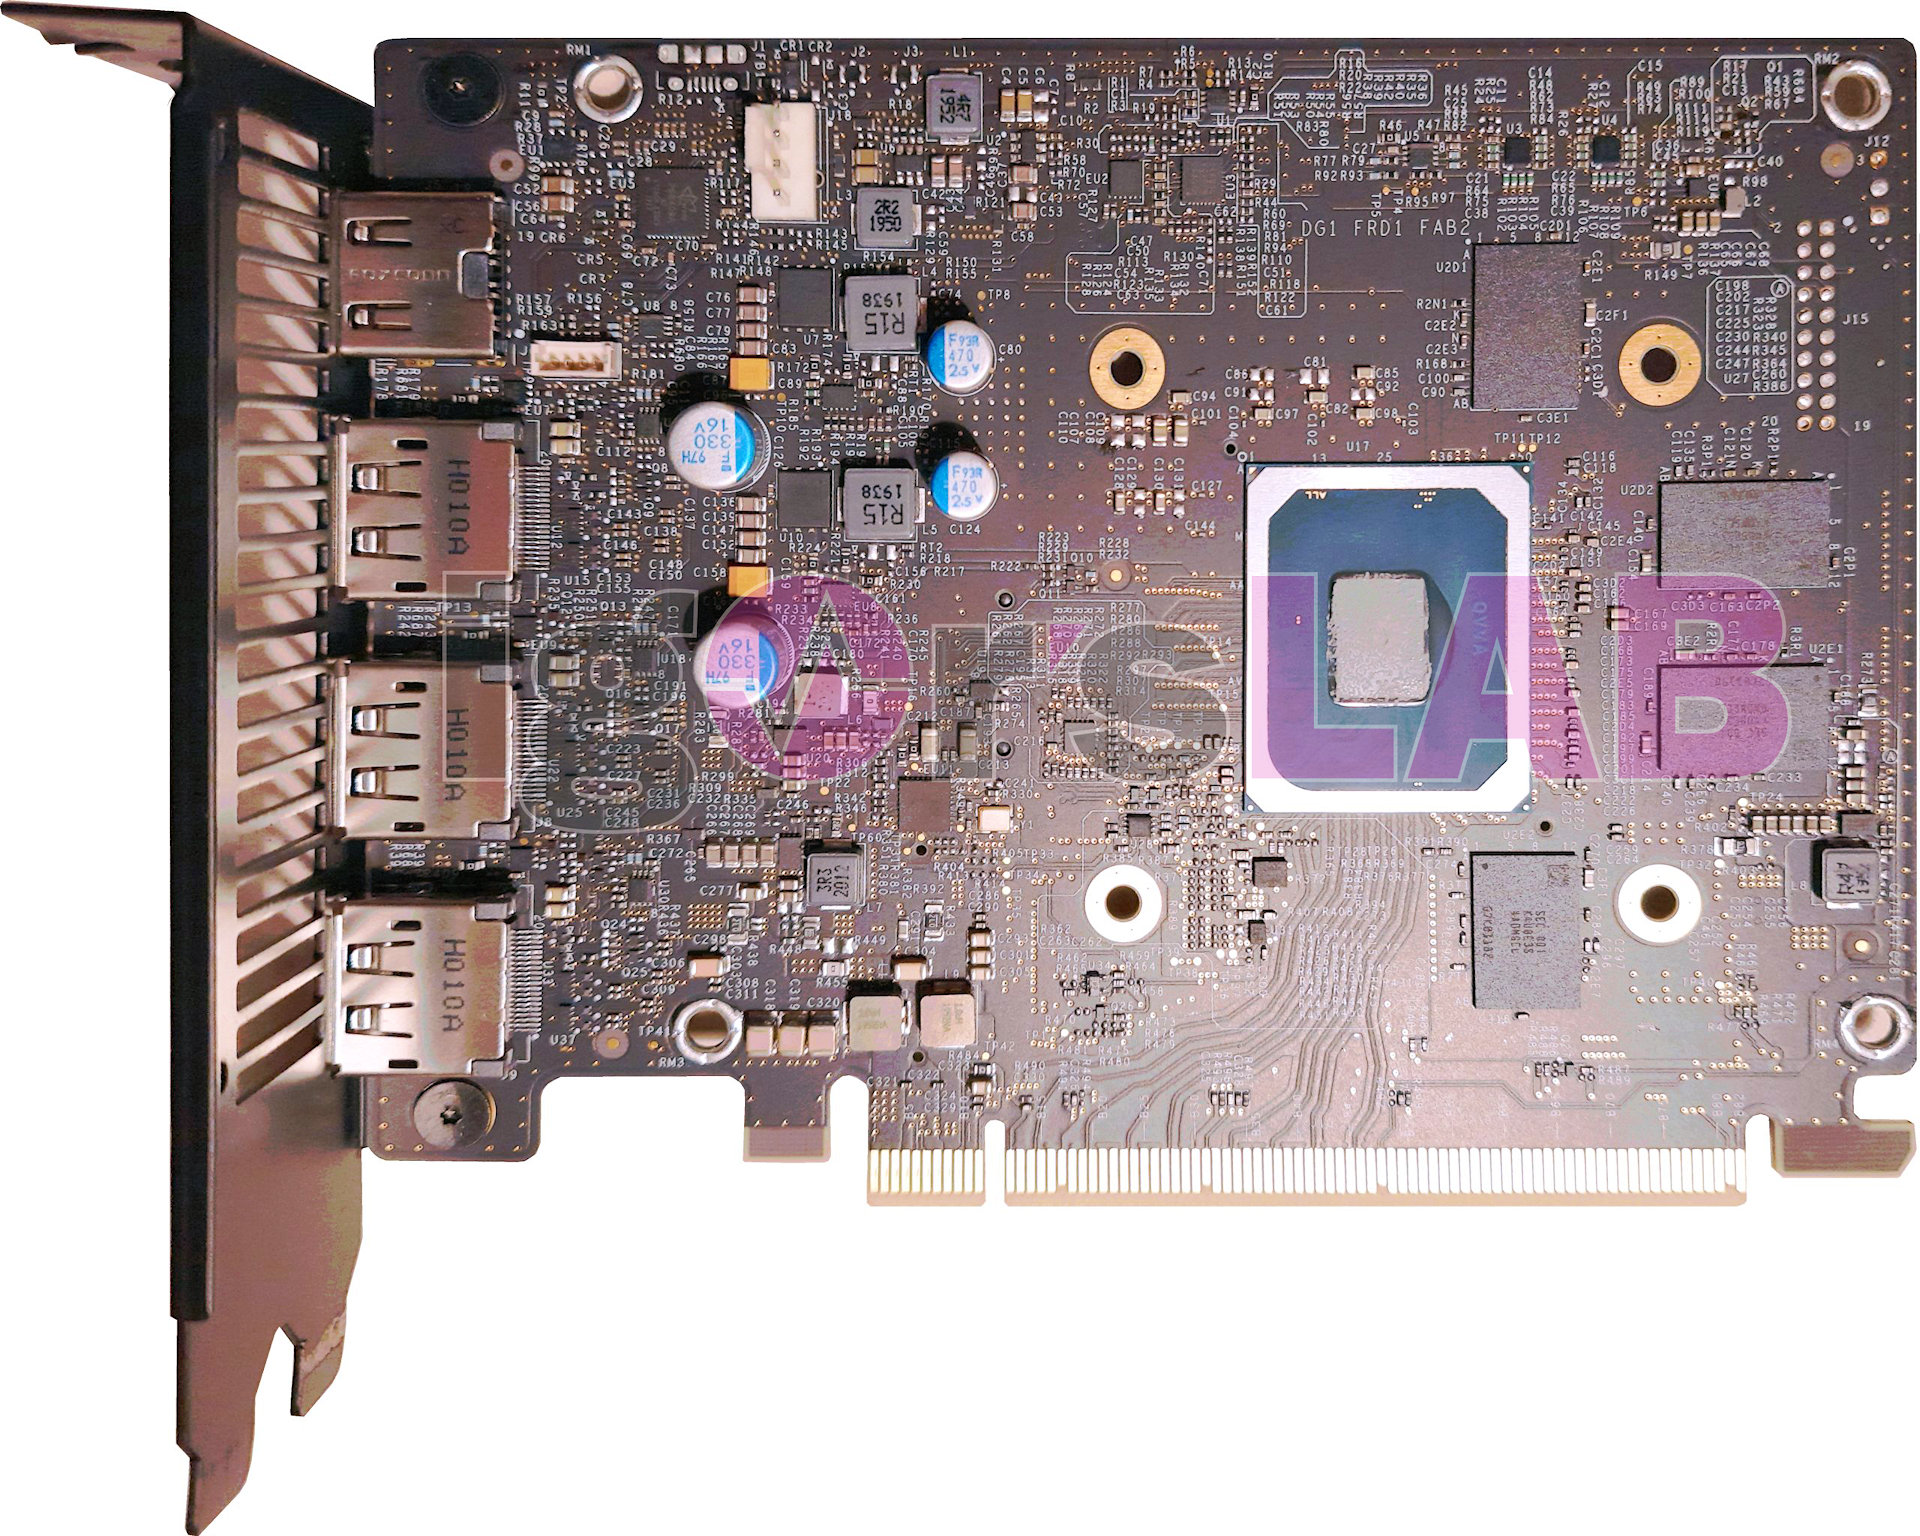 Intel DG1 SDV graphics card has been taken apart – VideoCardz.com